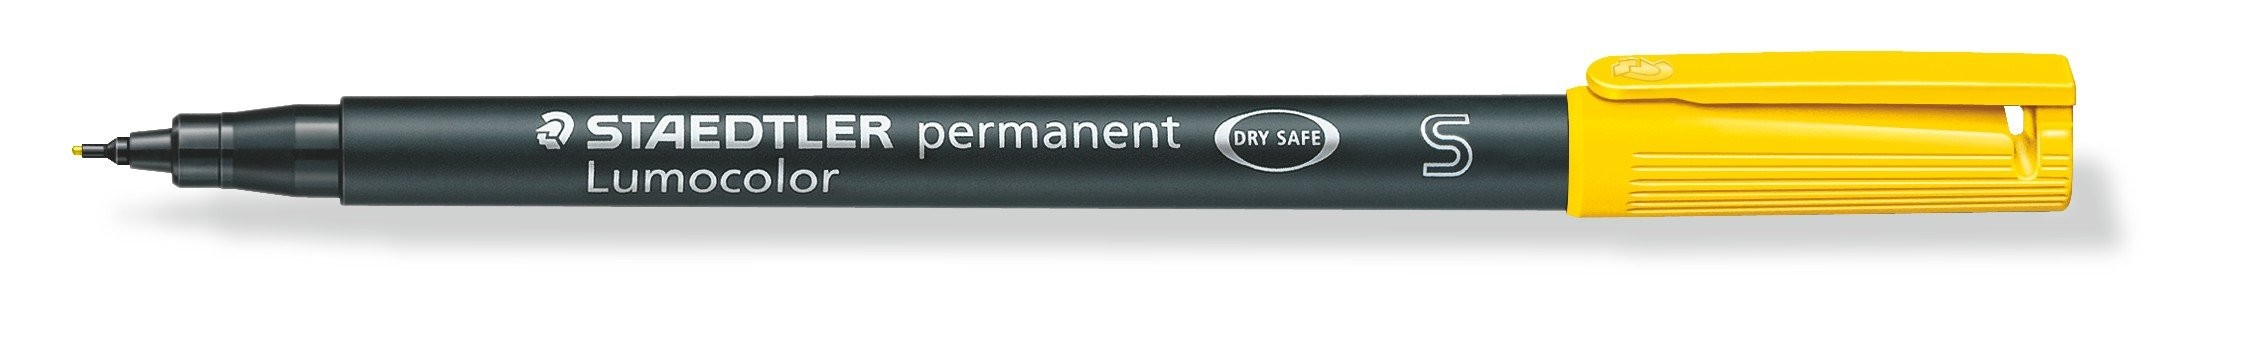 STAEDTLER Lumocolor permanent marker S